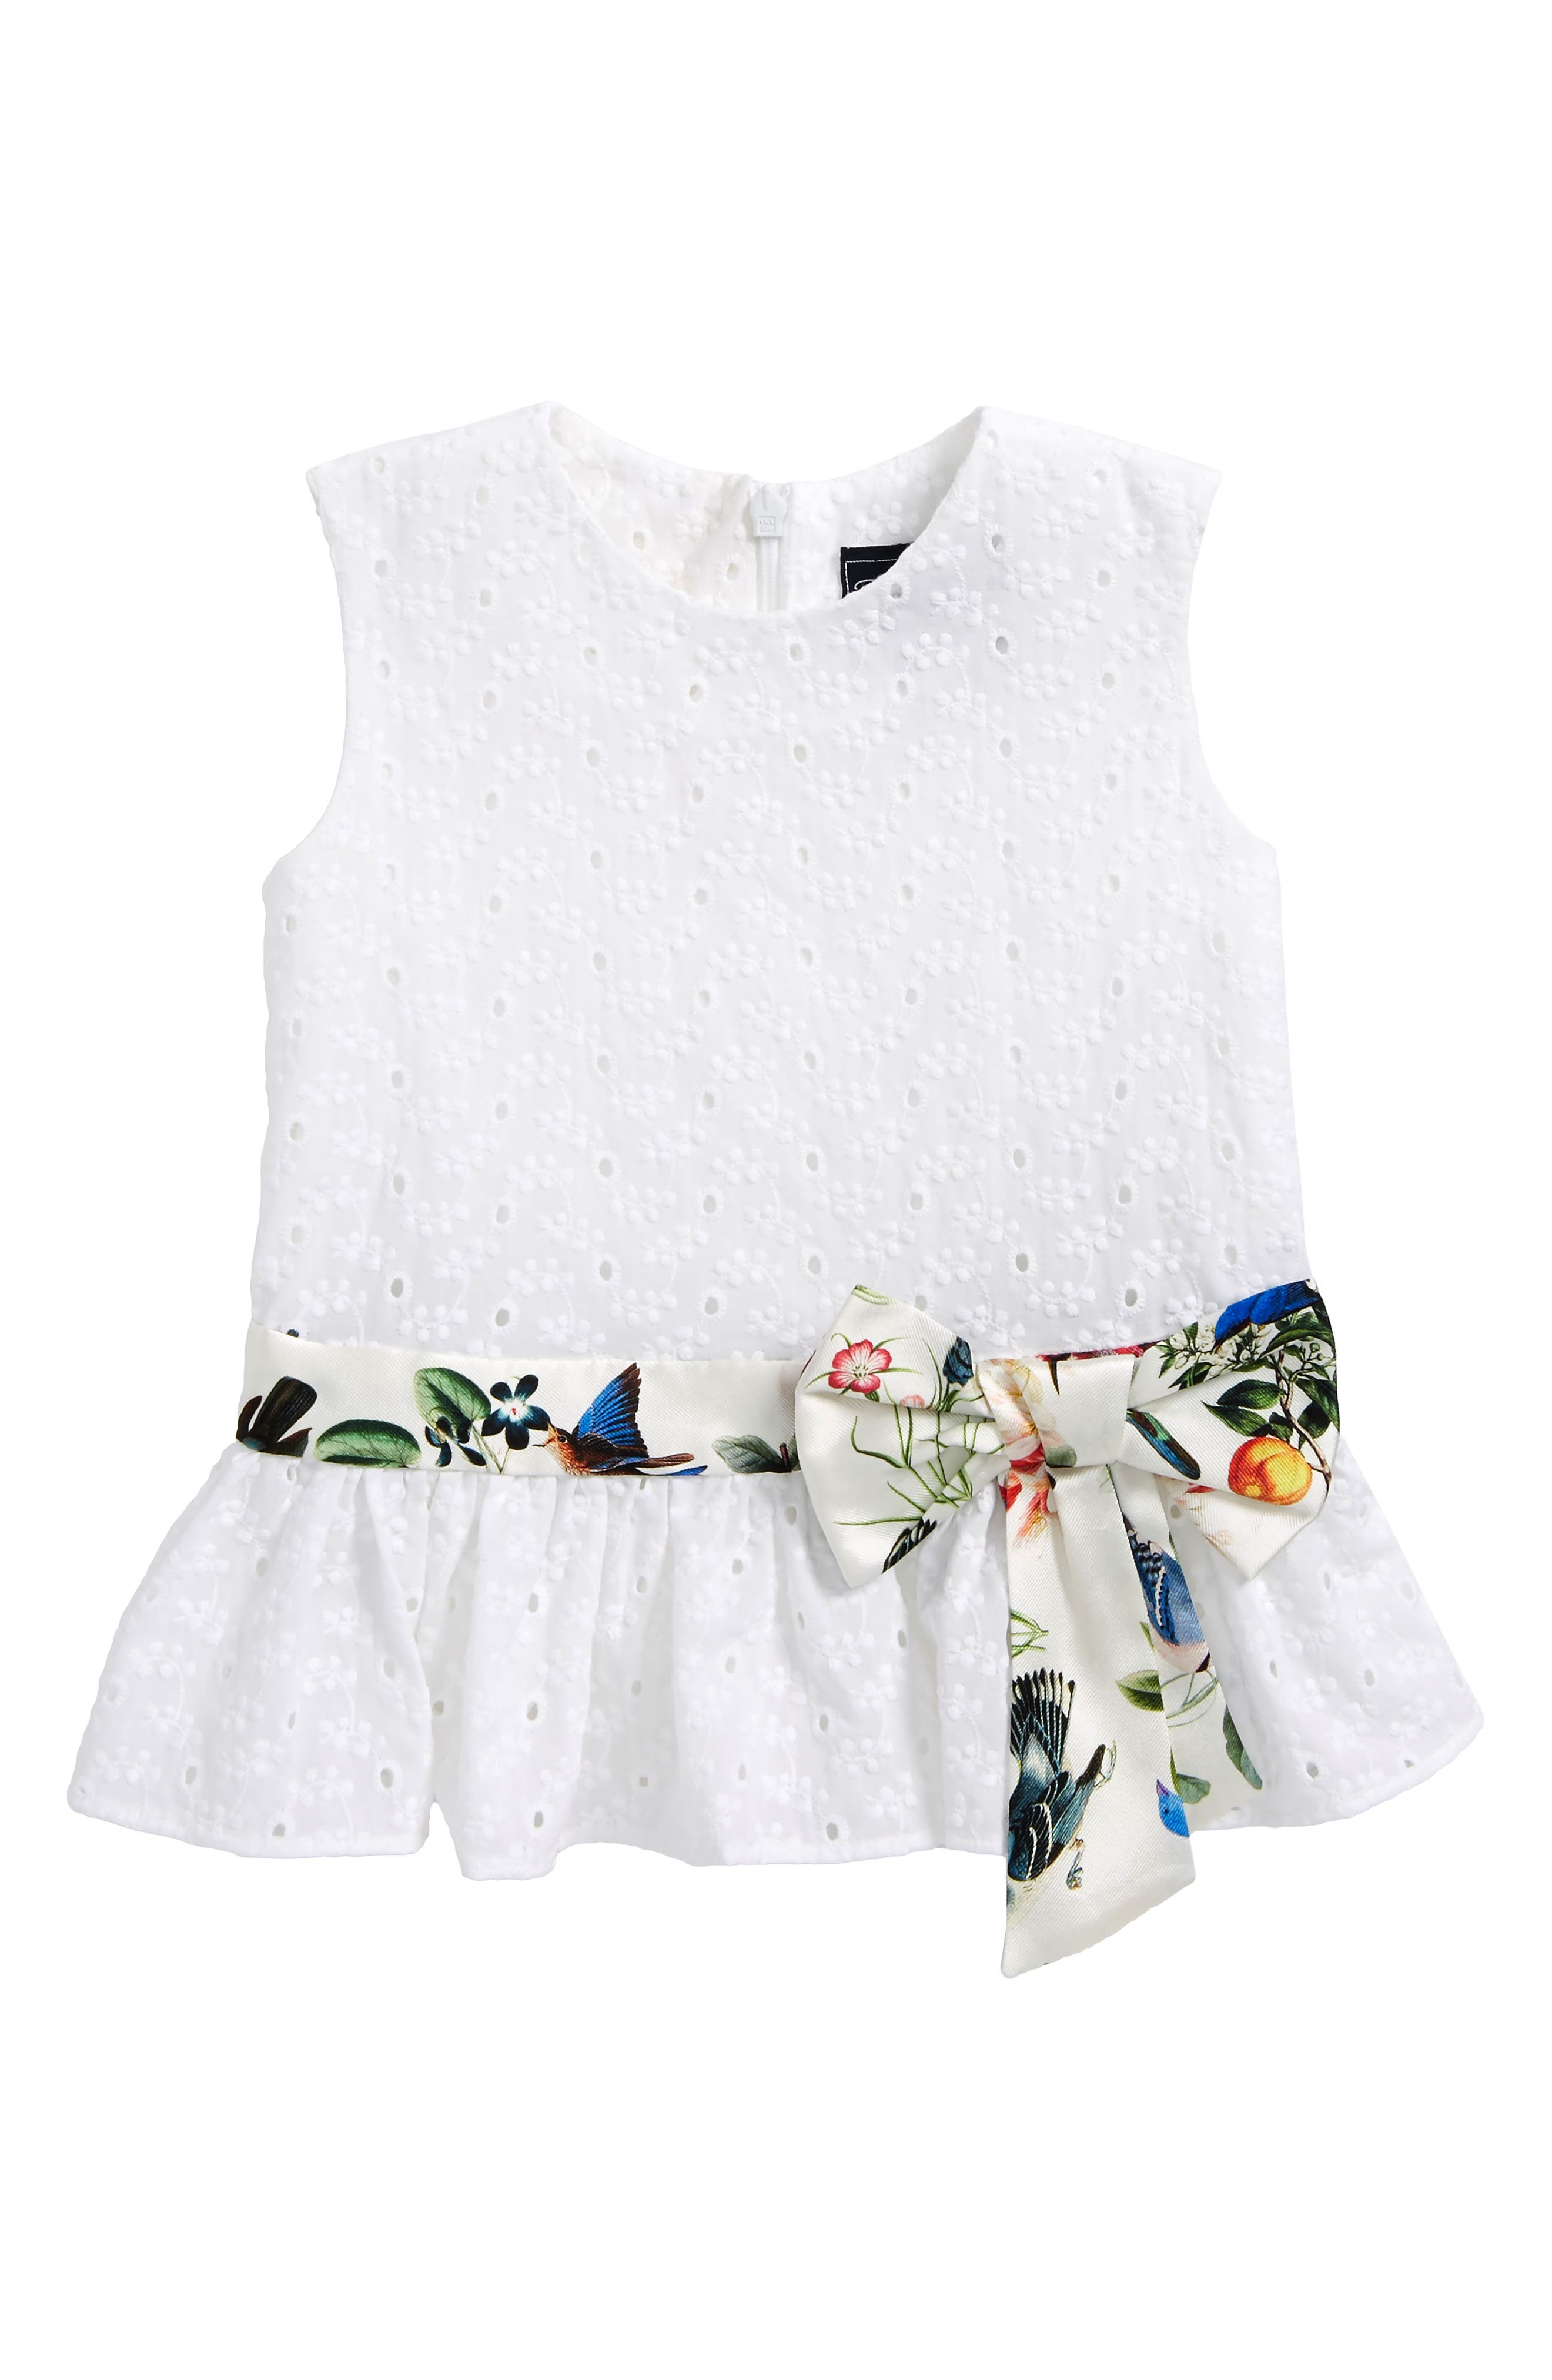 Alternate Image 1 Selected - Oscar de la Renta Small Flower Eyelet Peplum Dress (Toddler Girls, Little Girls & Big Girls)